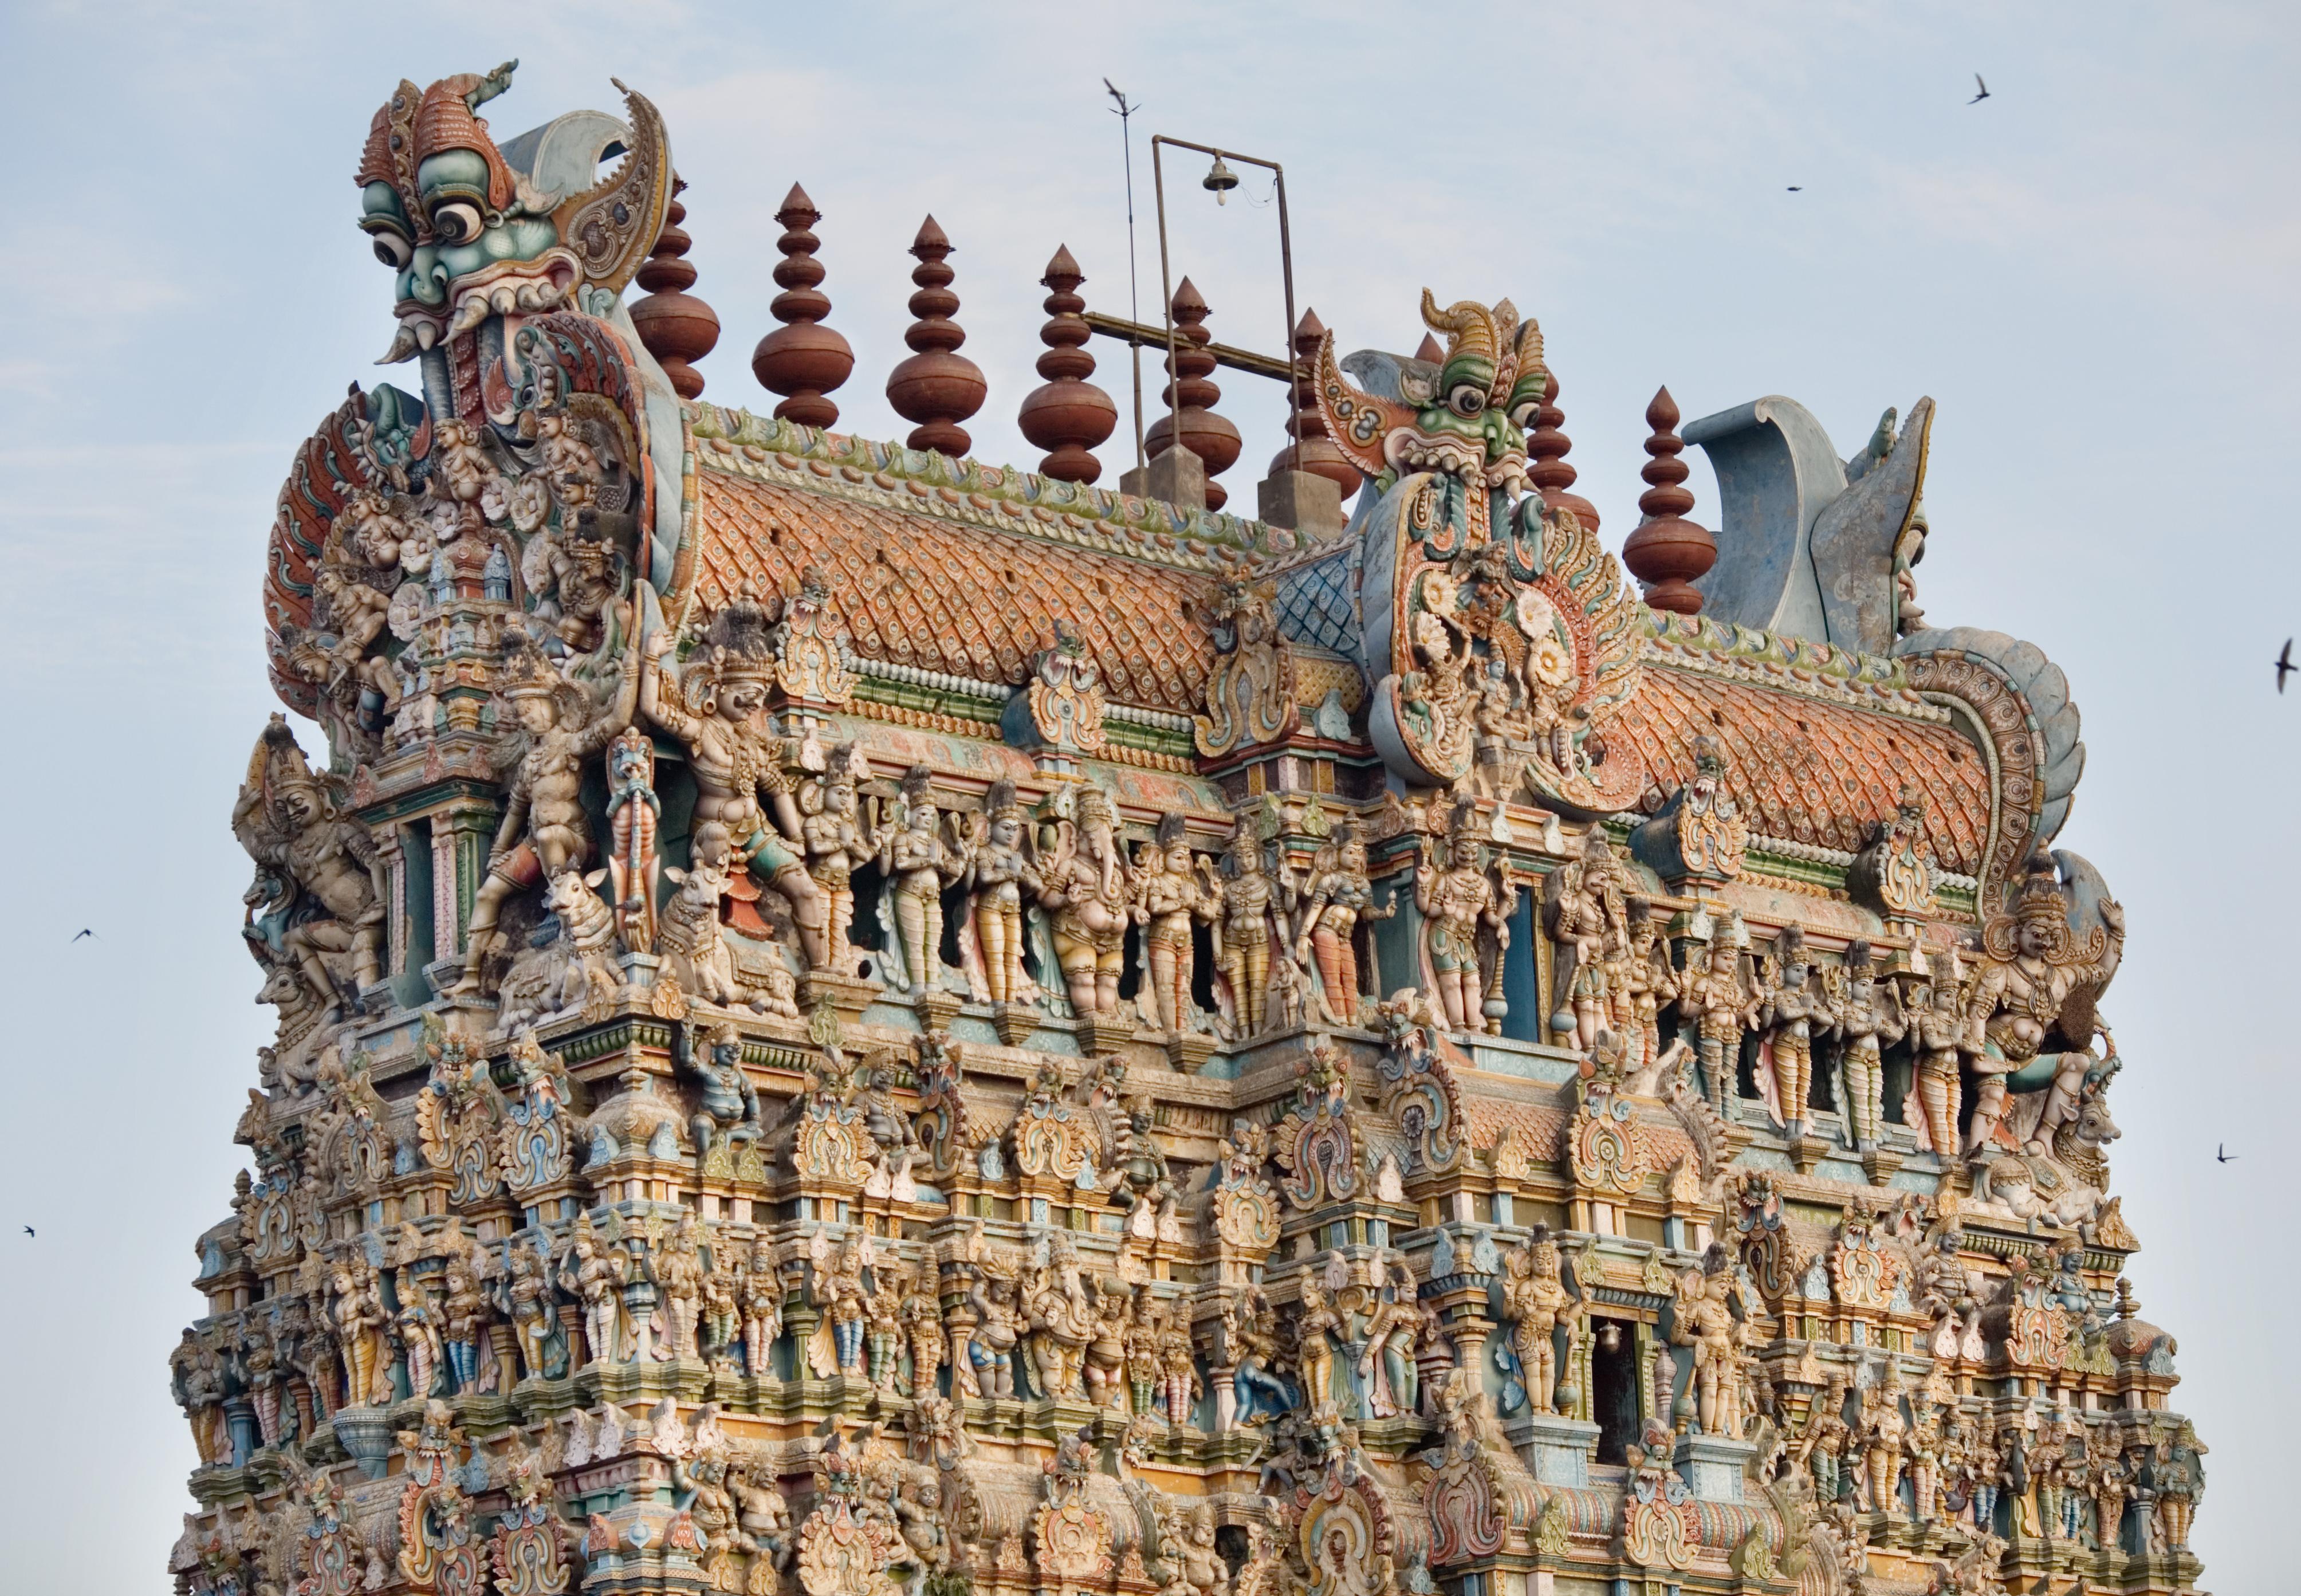 Madurai India  city photos gallery : Fichier:India Madurai temple 0788 — Wikipédia